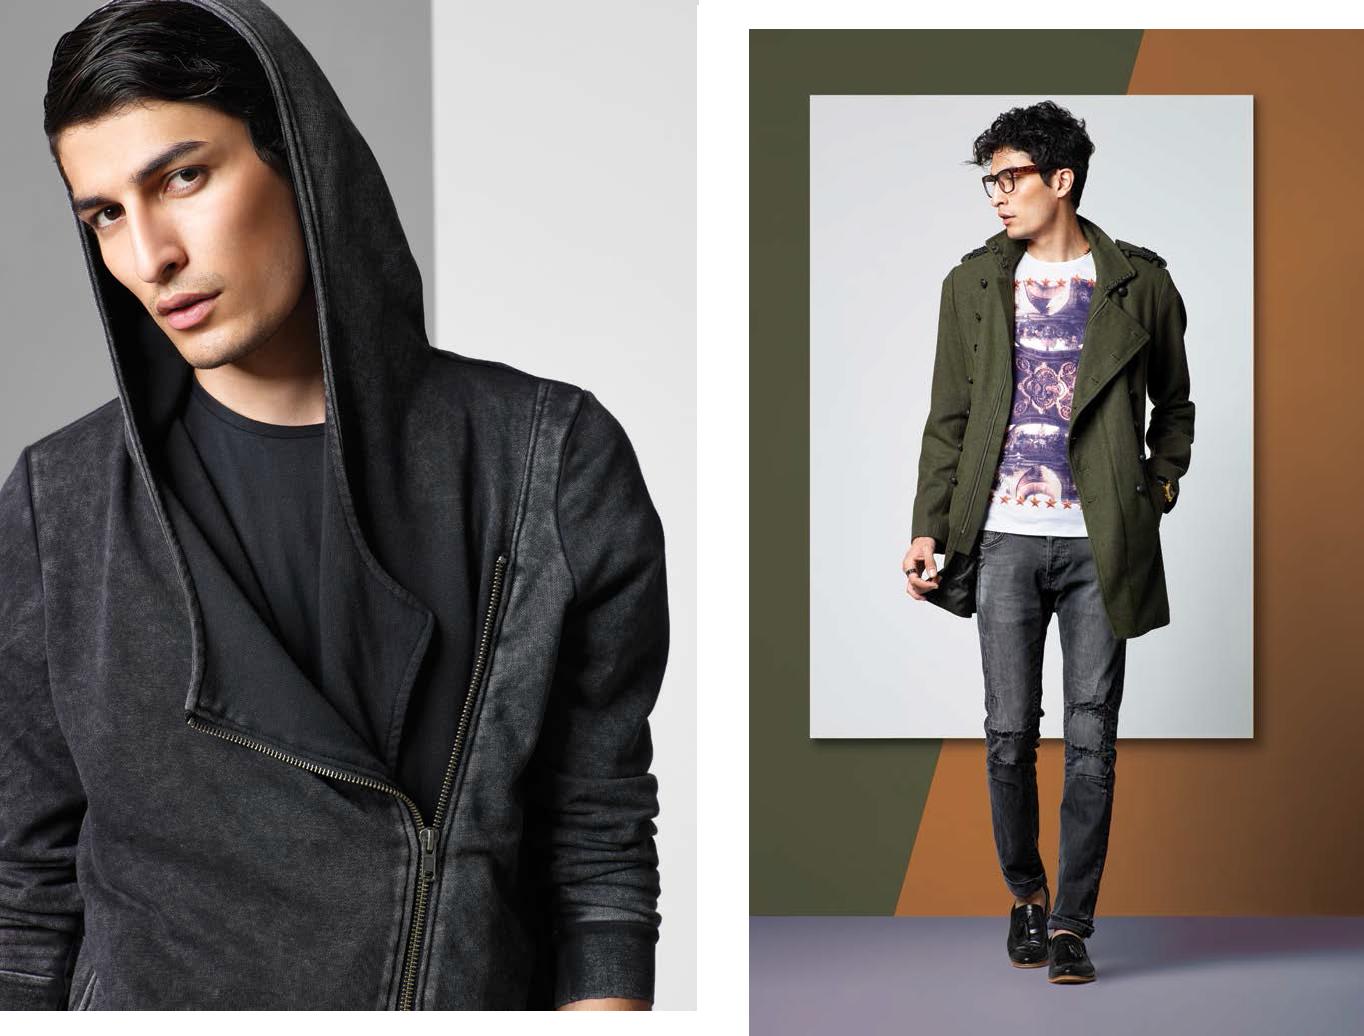 renaissance_fashion_style